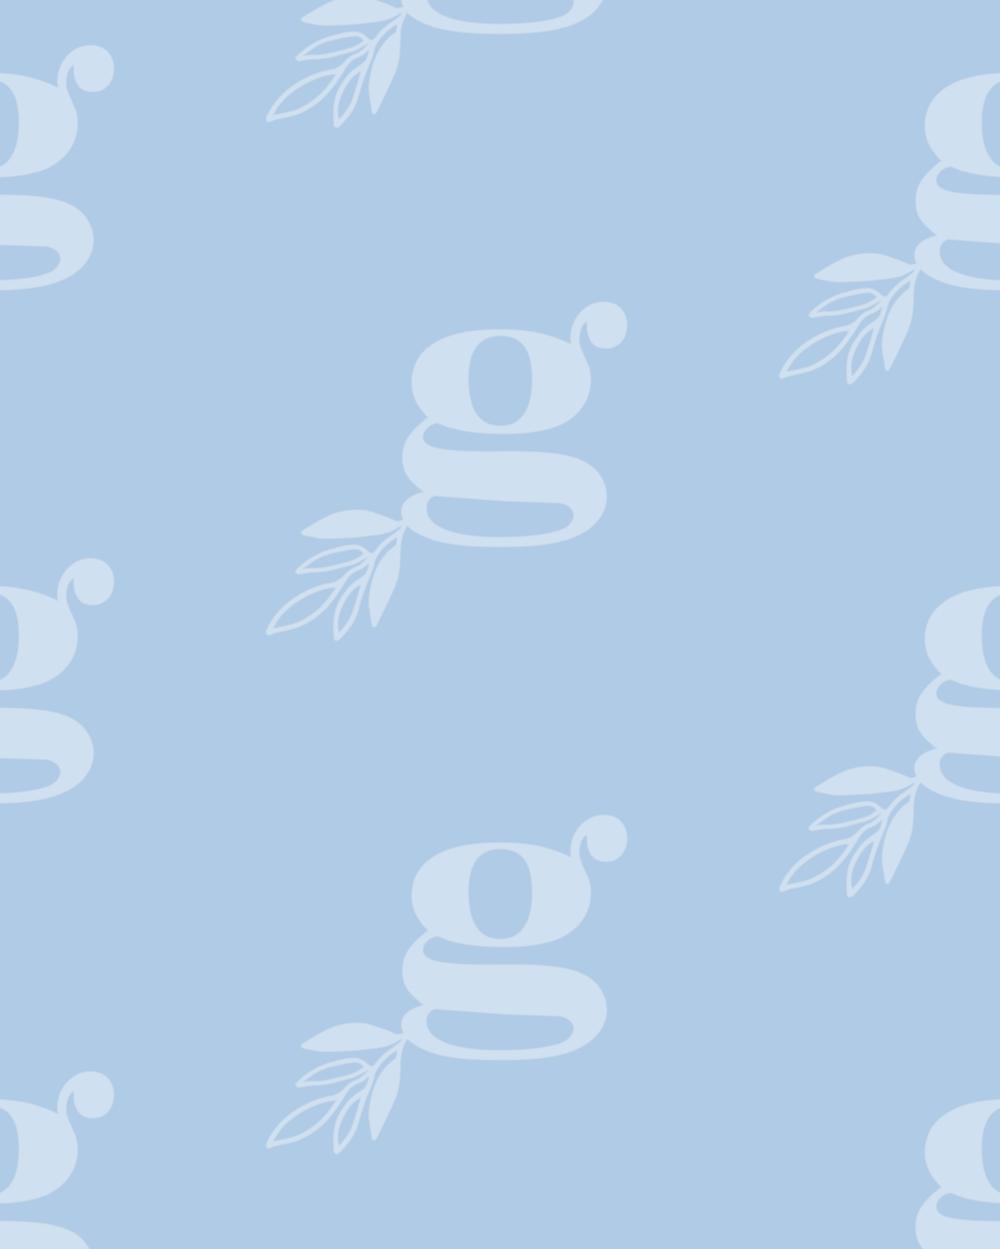 Branding for Matcha Company - Matcha Branding.png